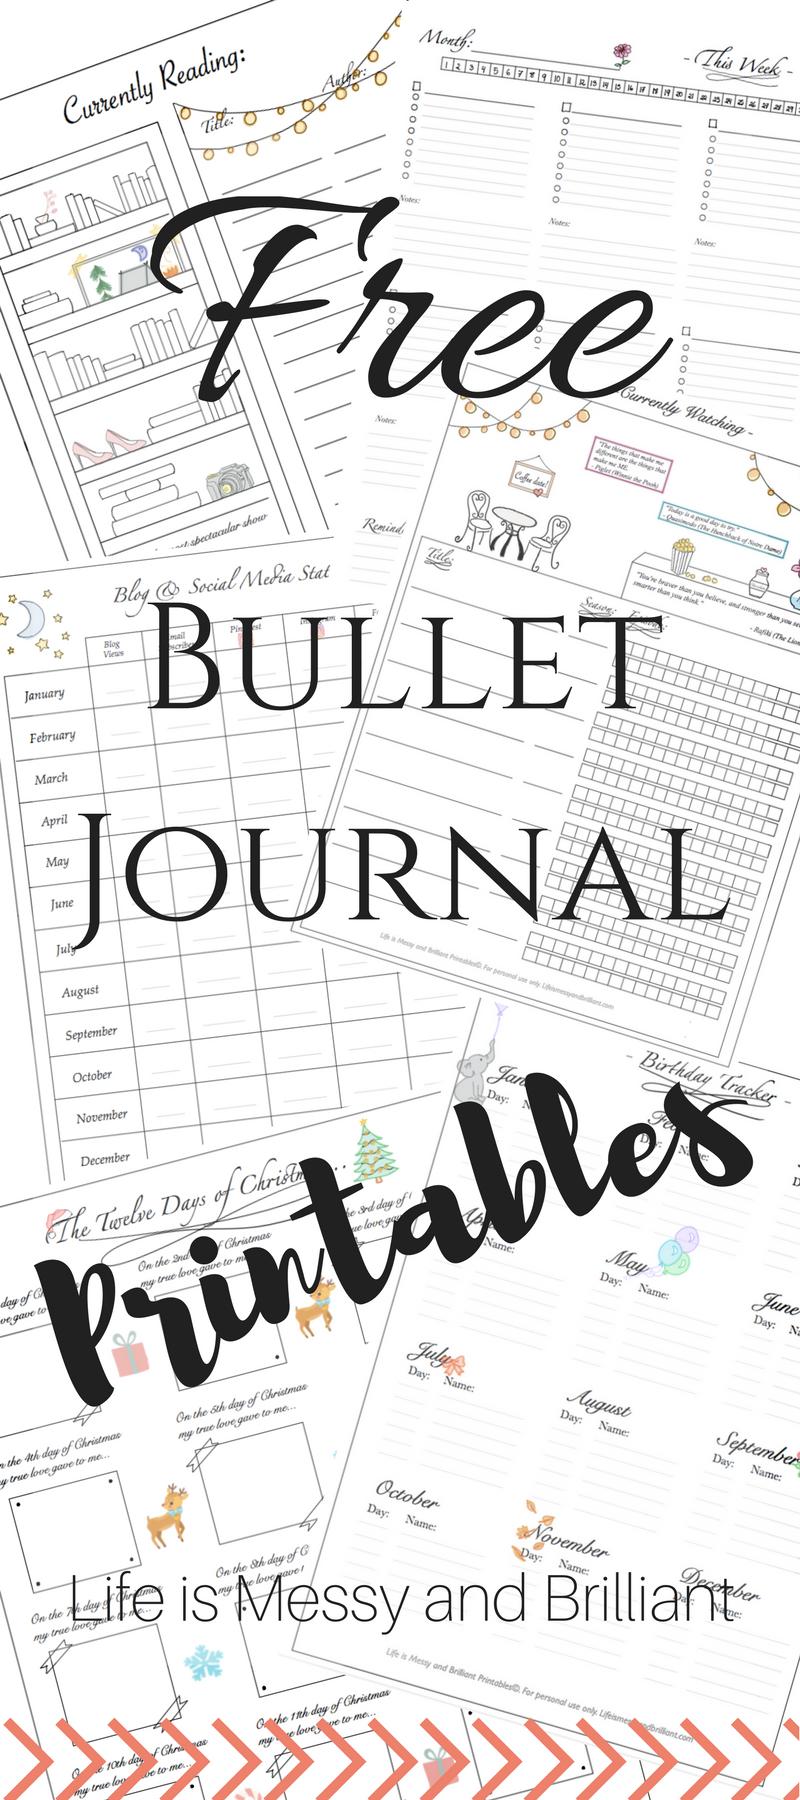 Free Bullet Journal Printables Bullet Journal Printables Journal Printables Free Journal